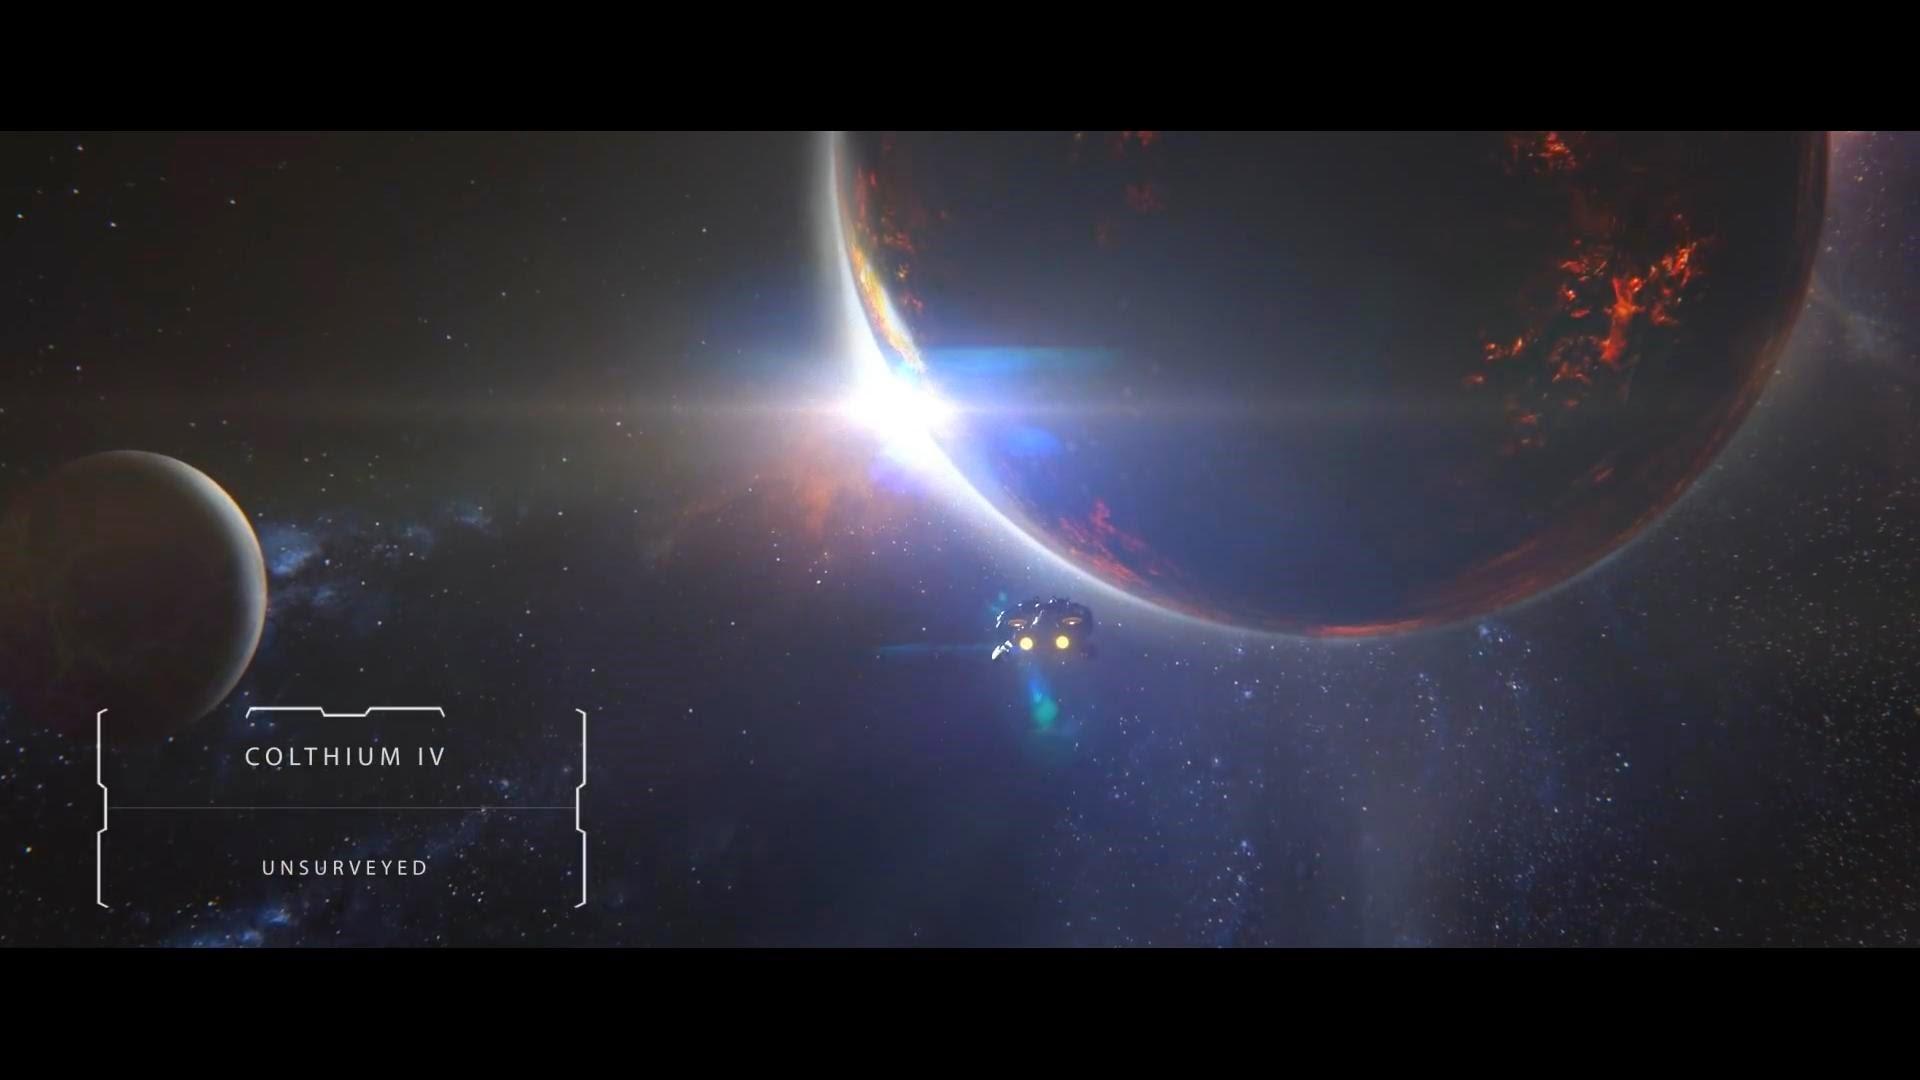 24+ Stellaris Wallpaper Phone Images